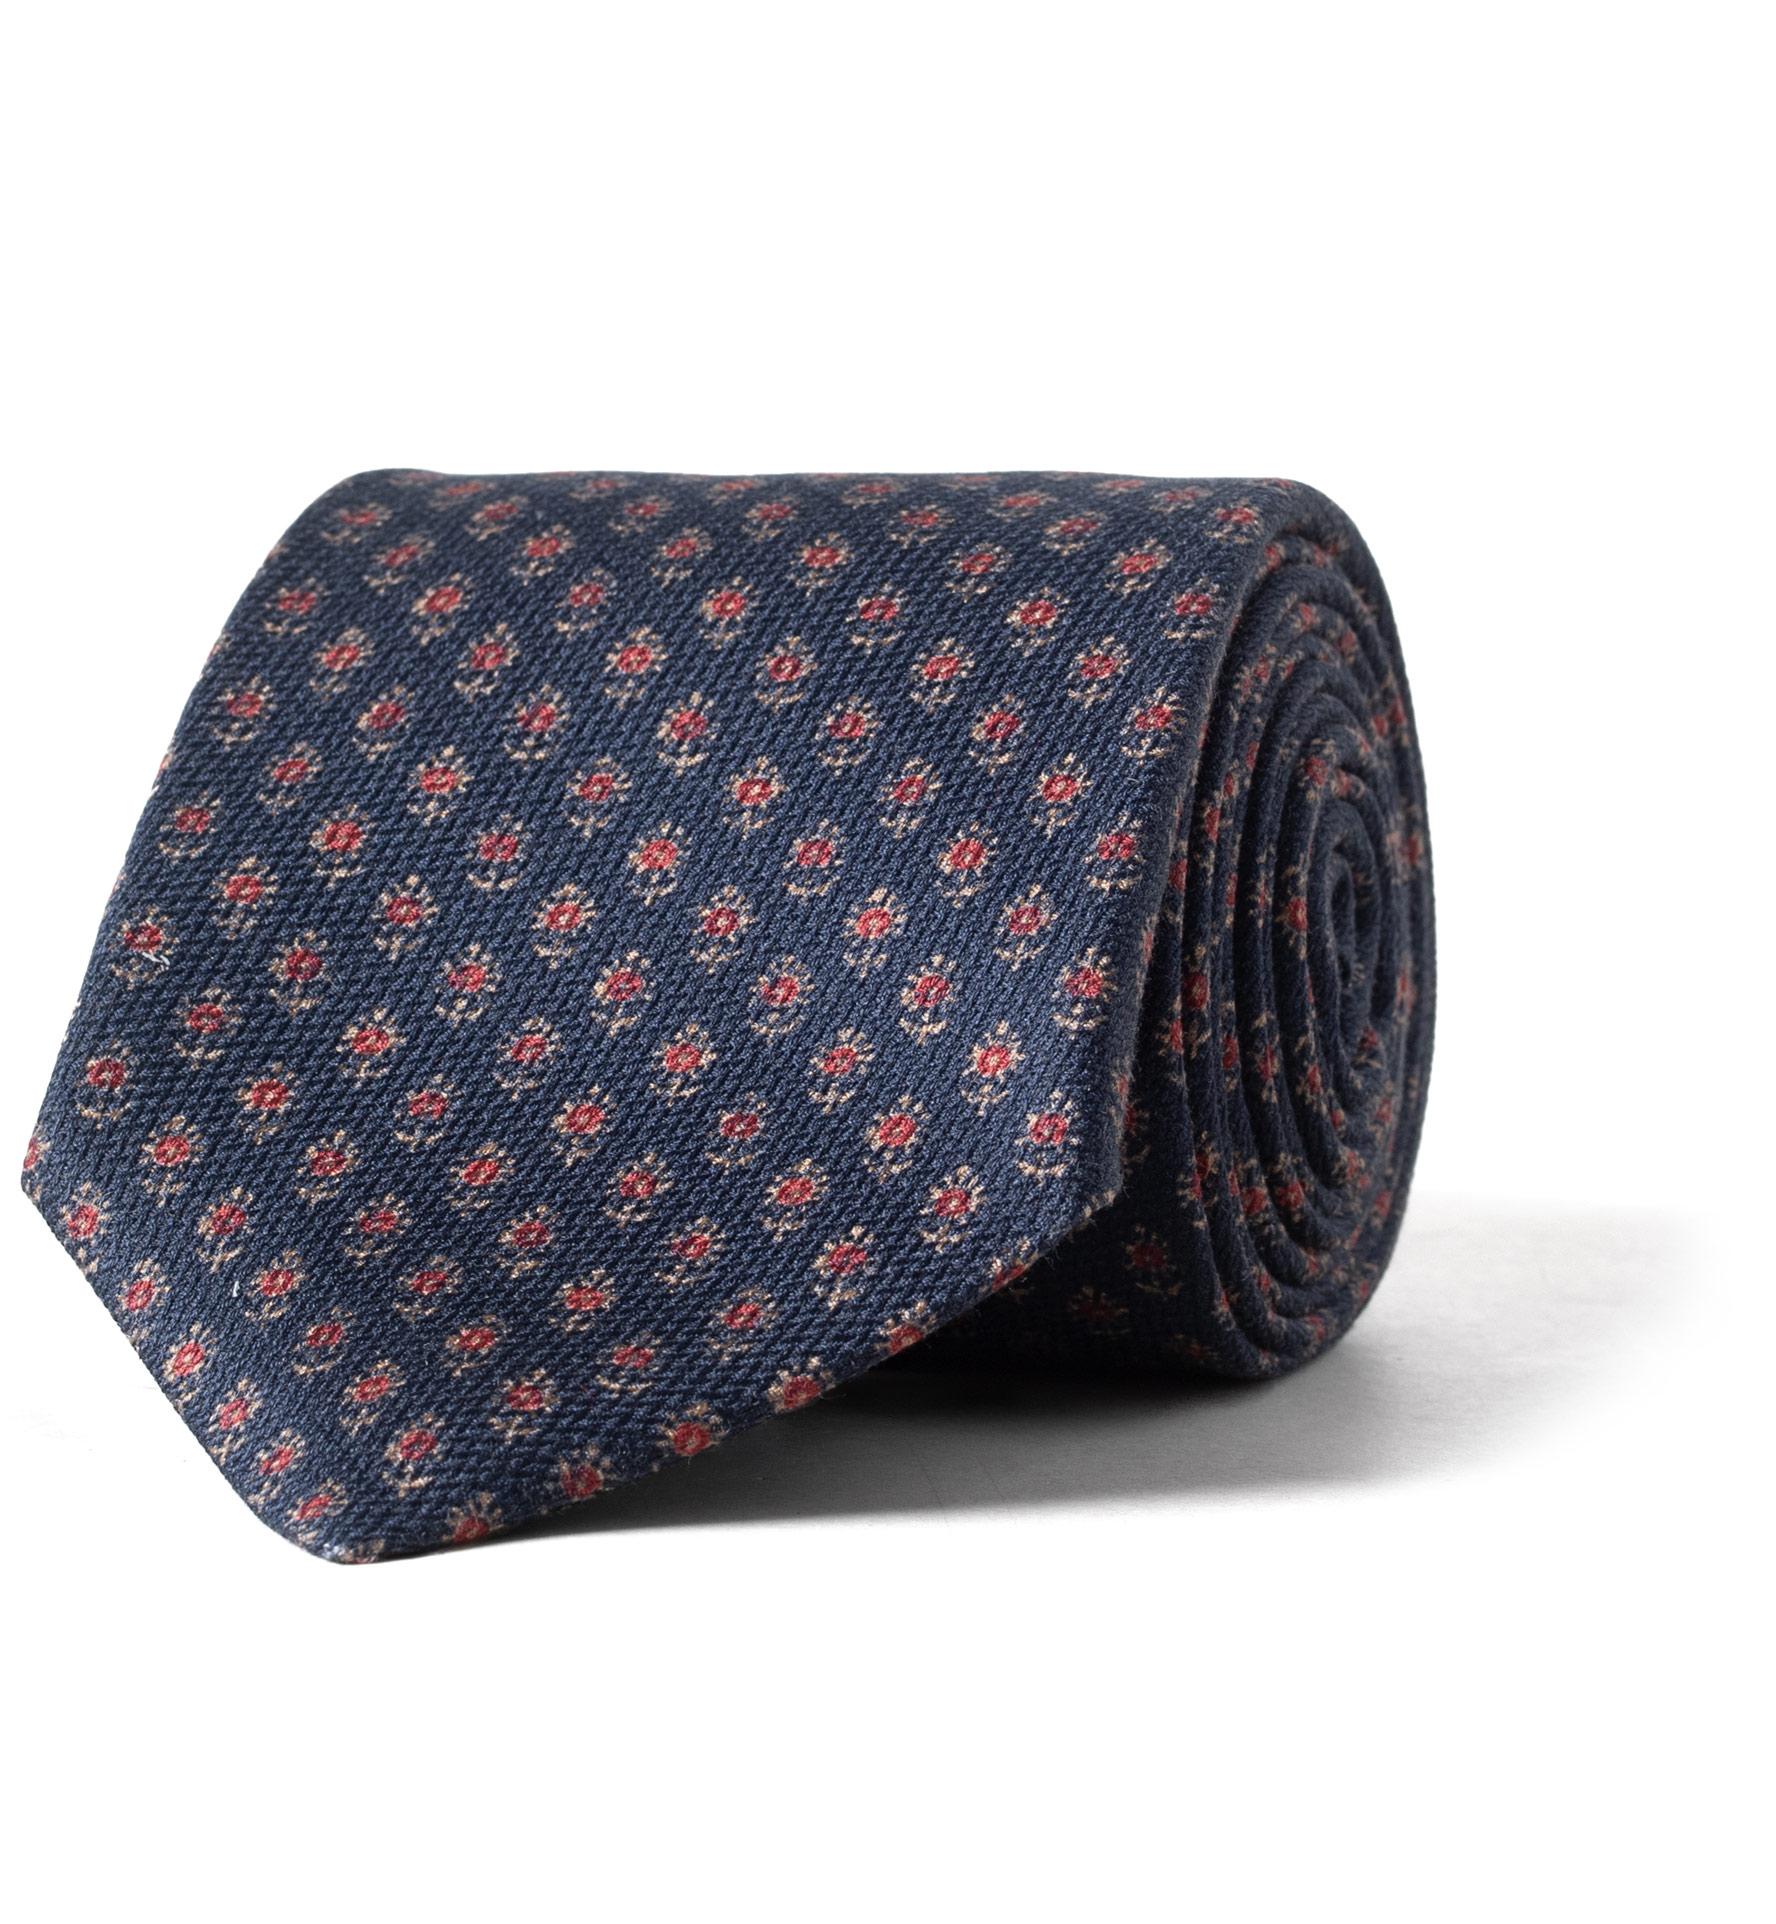 Zoom Image of Navy Indian Block Print Silk Tie